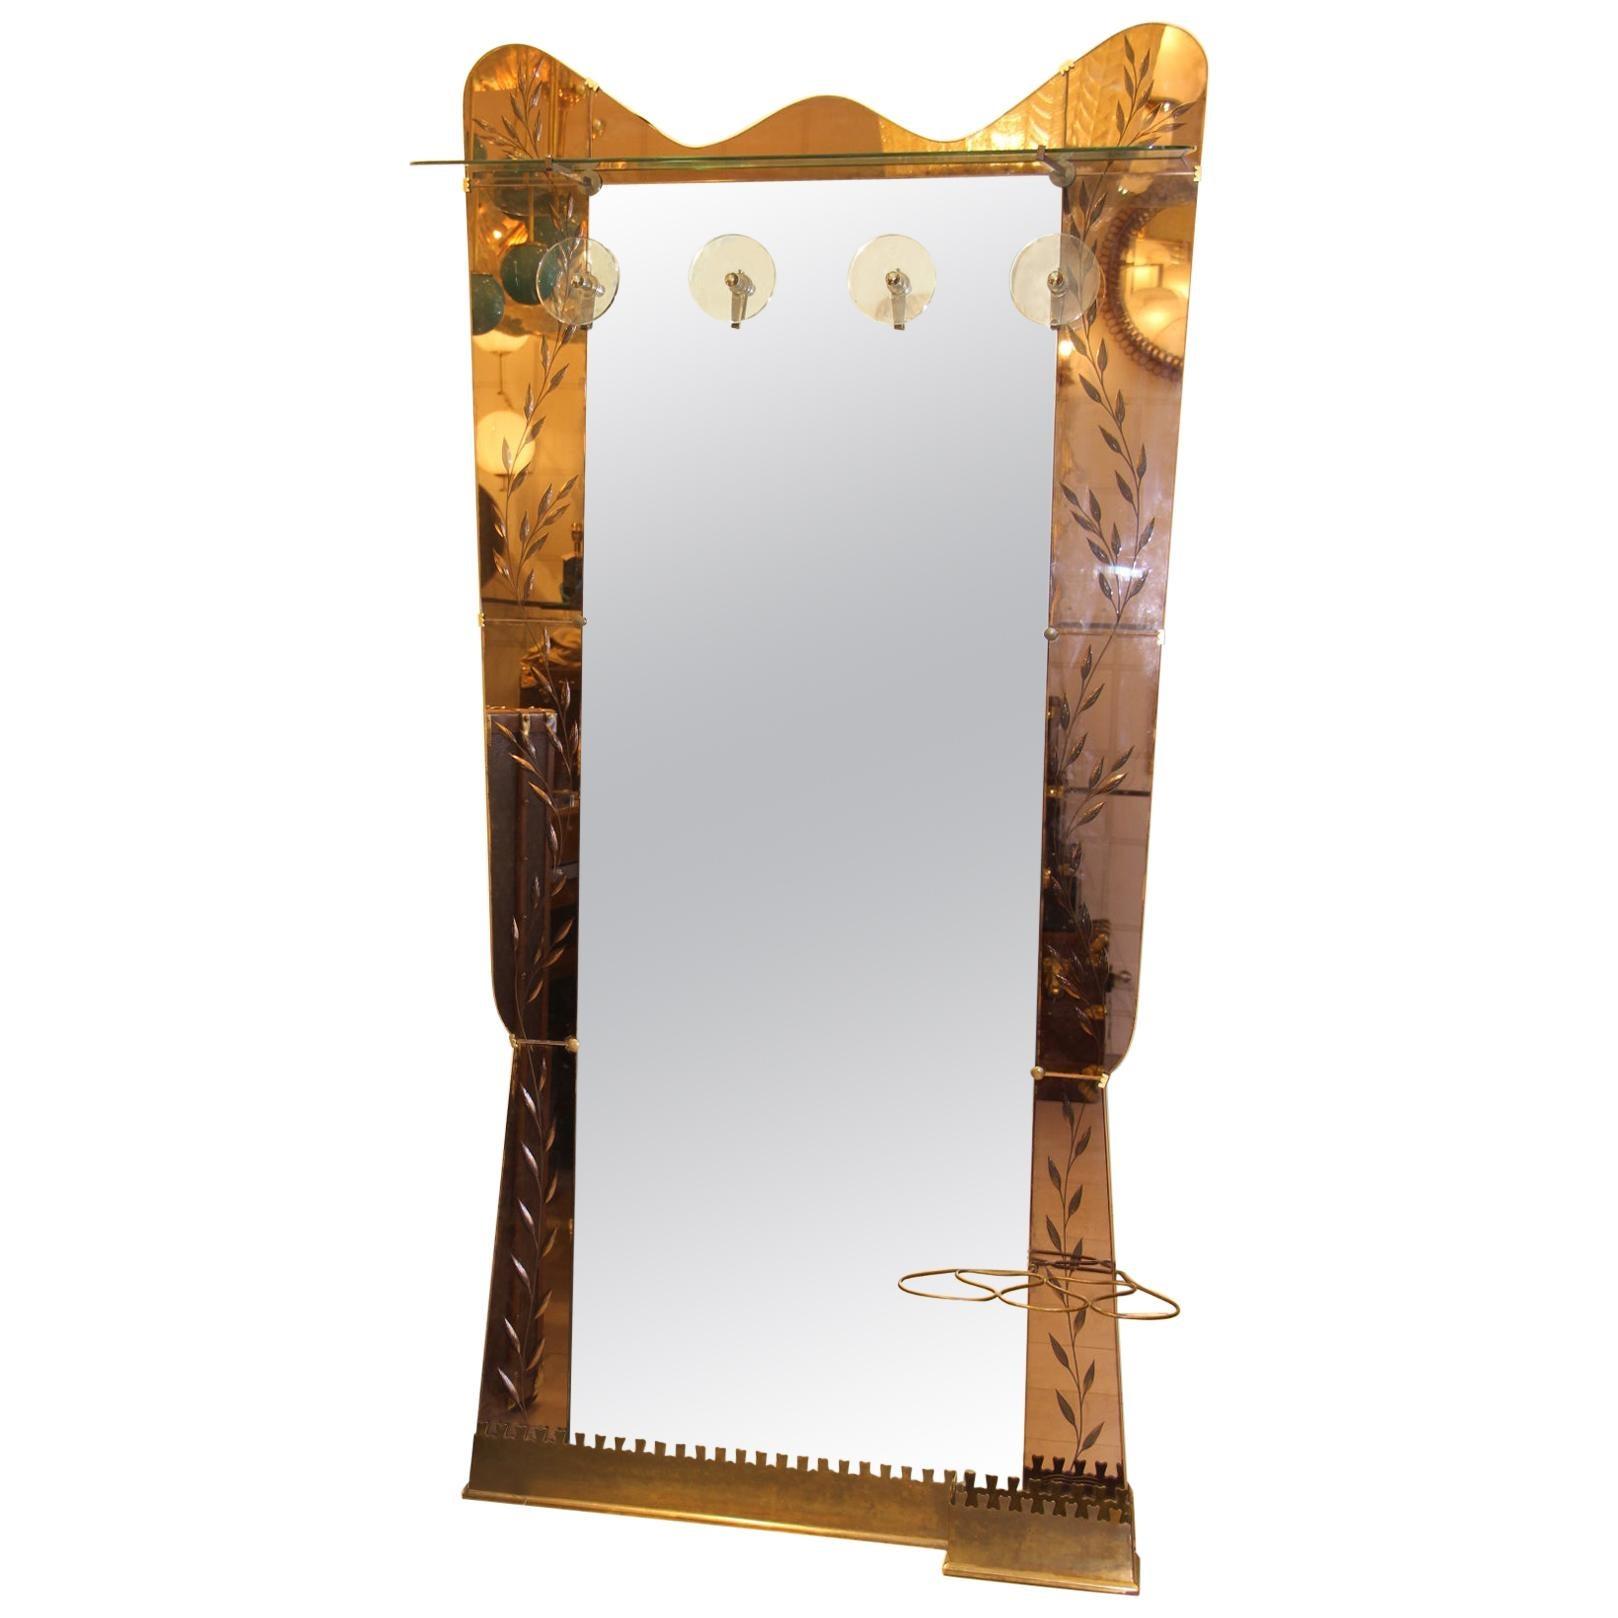 Cristal Arte Wall Mirror, Wall Coat Rack, Large Standing Mirror, Umbrella Stand